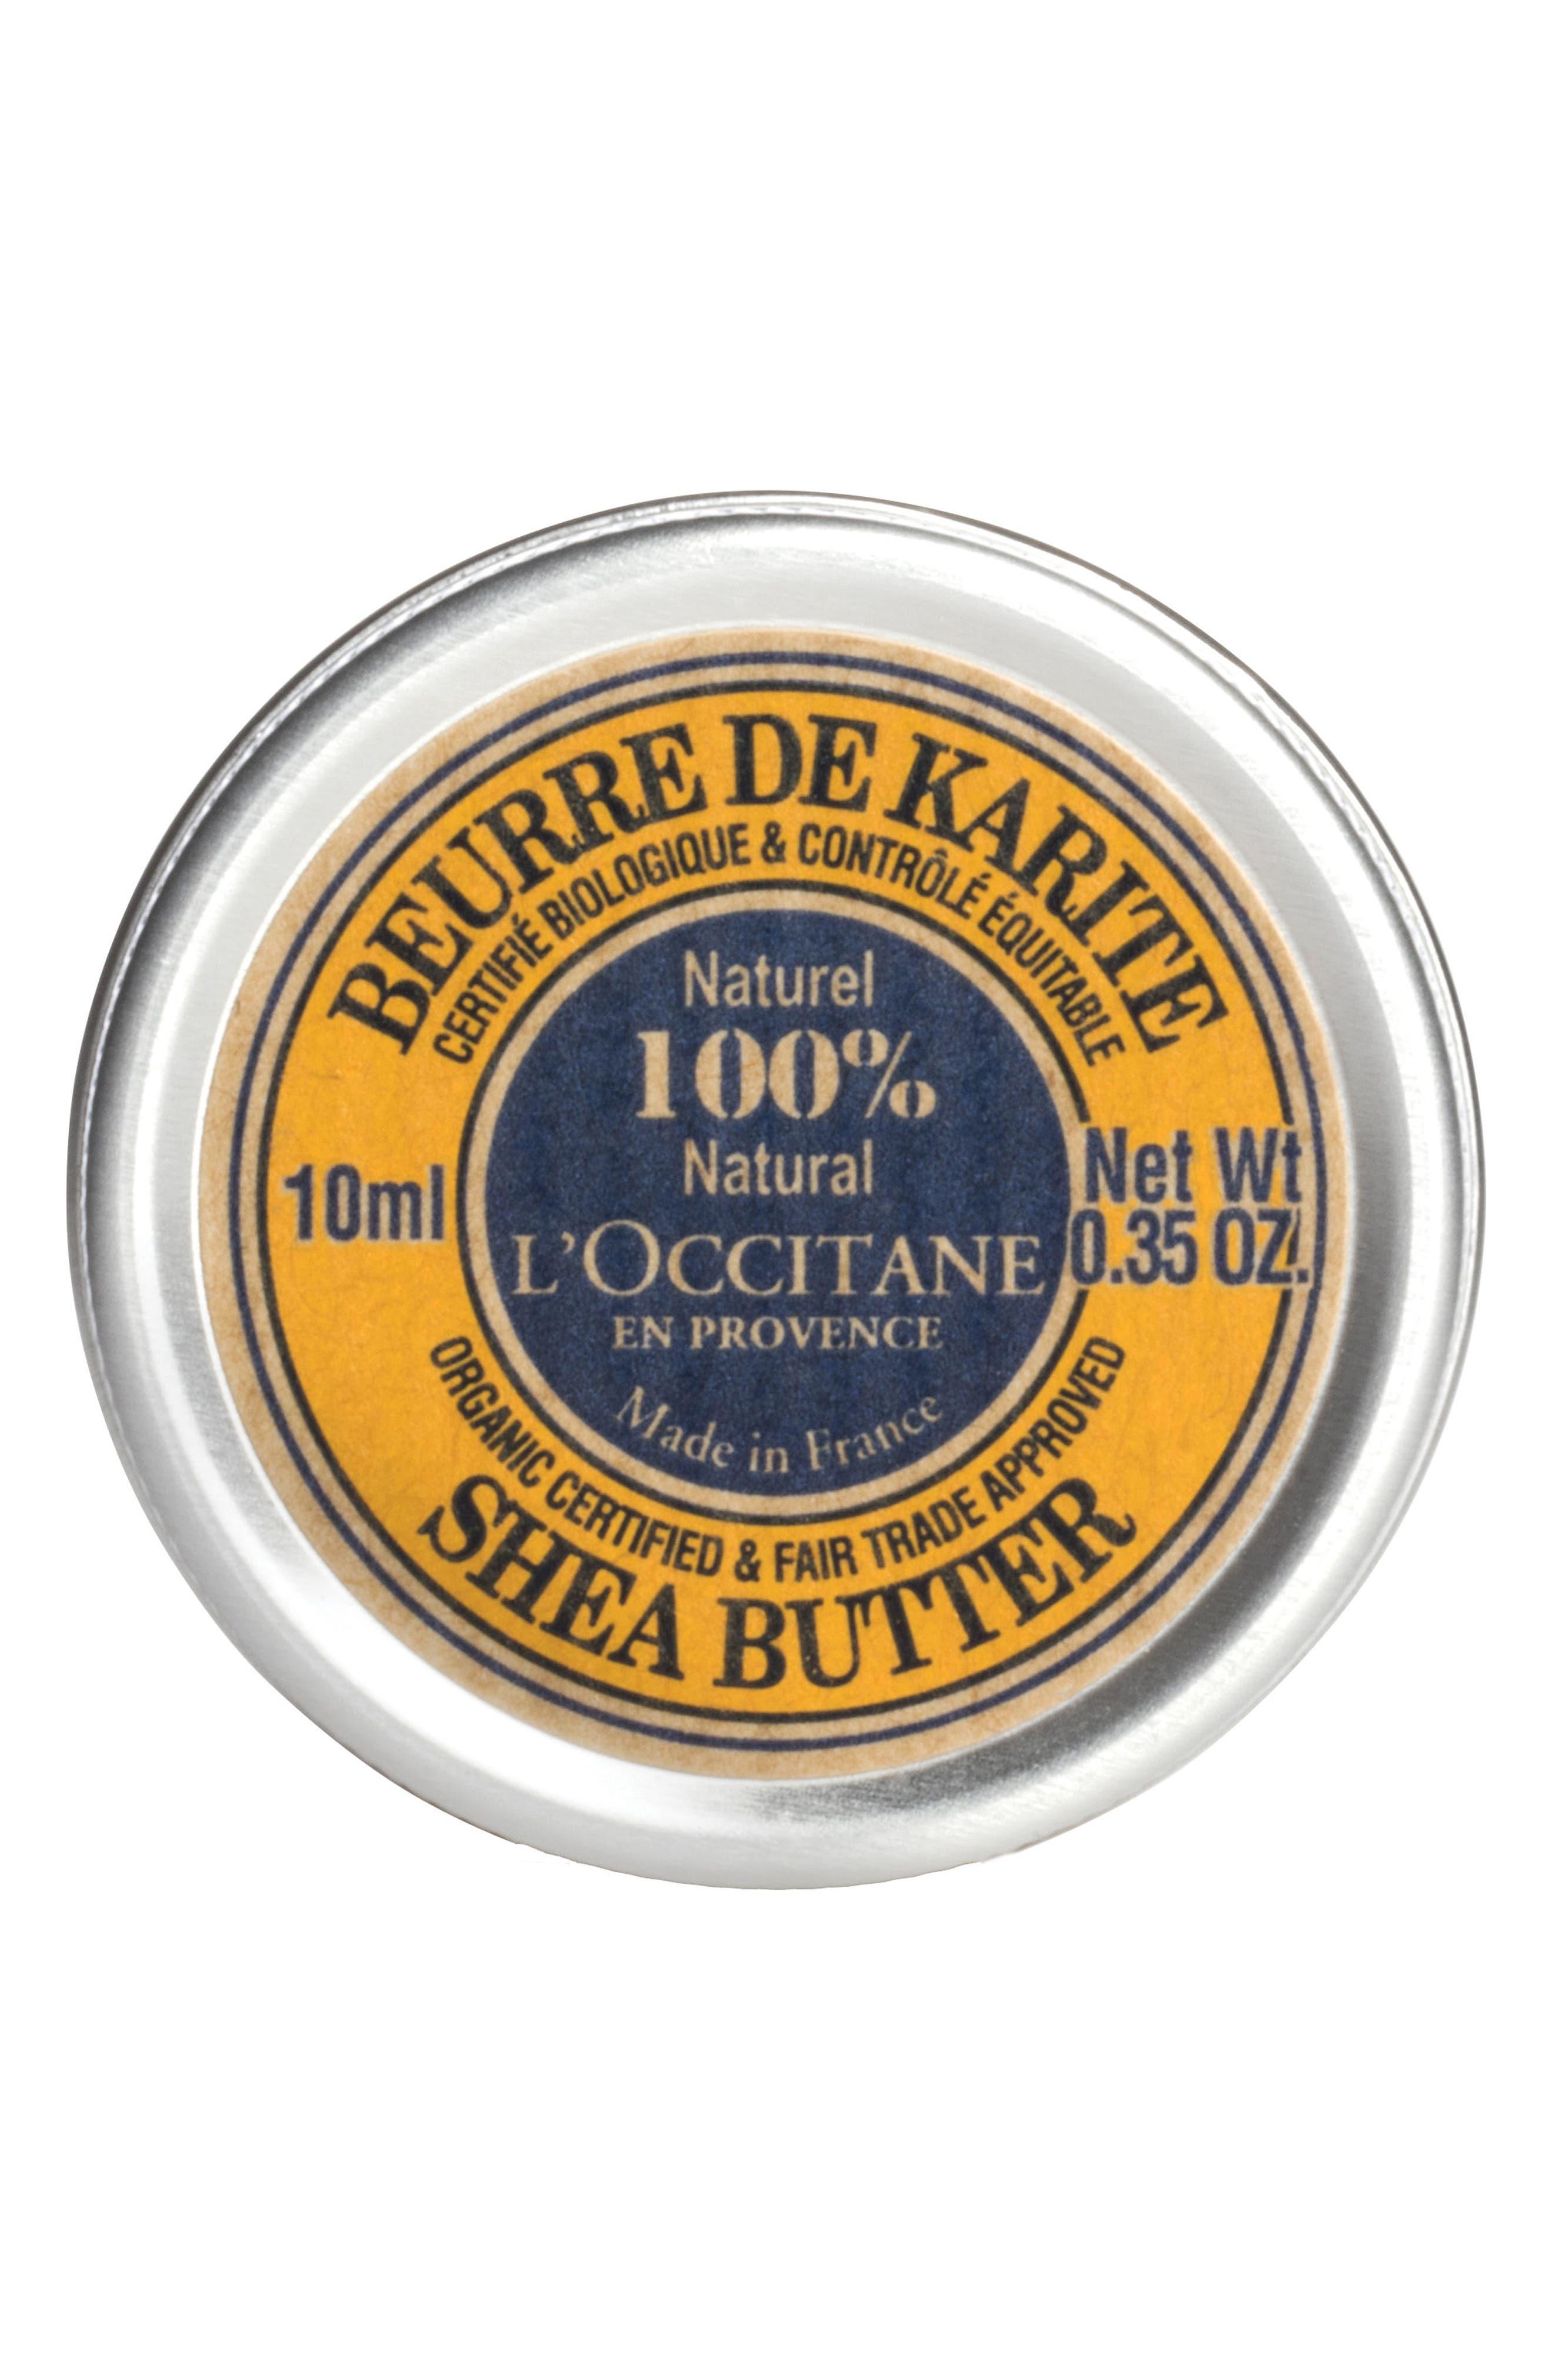 Mini Pure Shea Butter